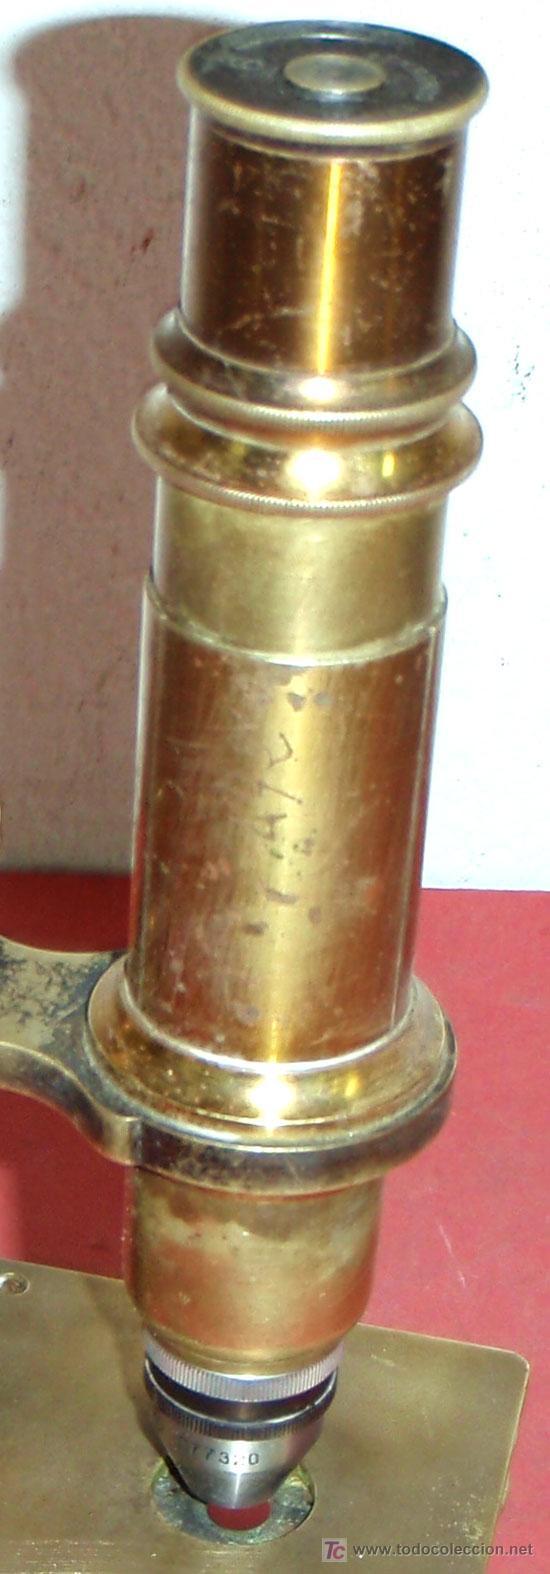 Antigüedades: MICROSCOPIO C1880/1900 - Foto 6 - 17295836